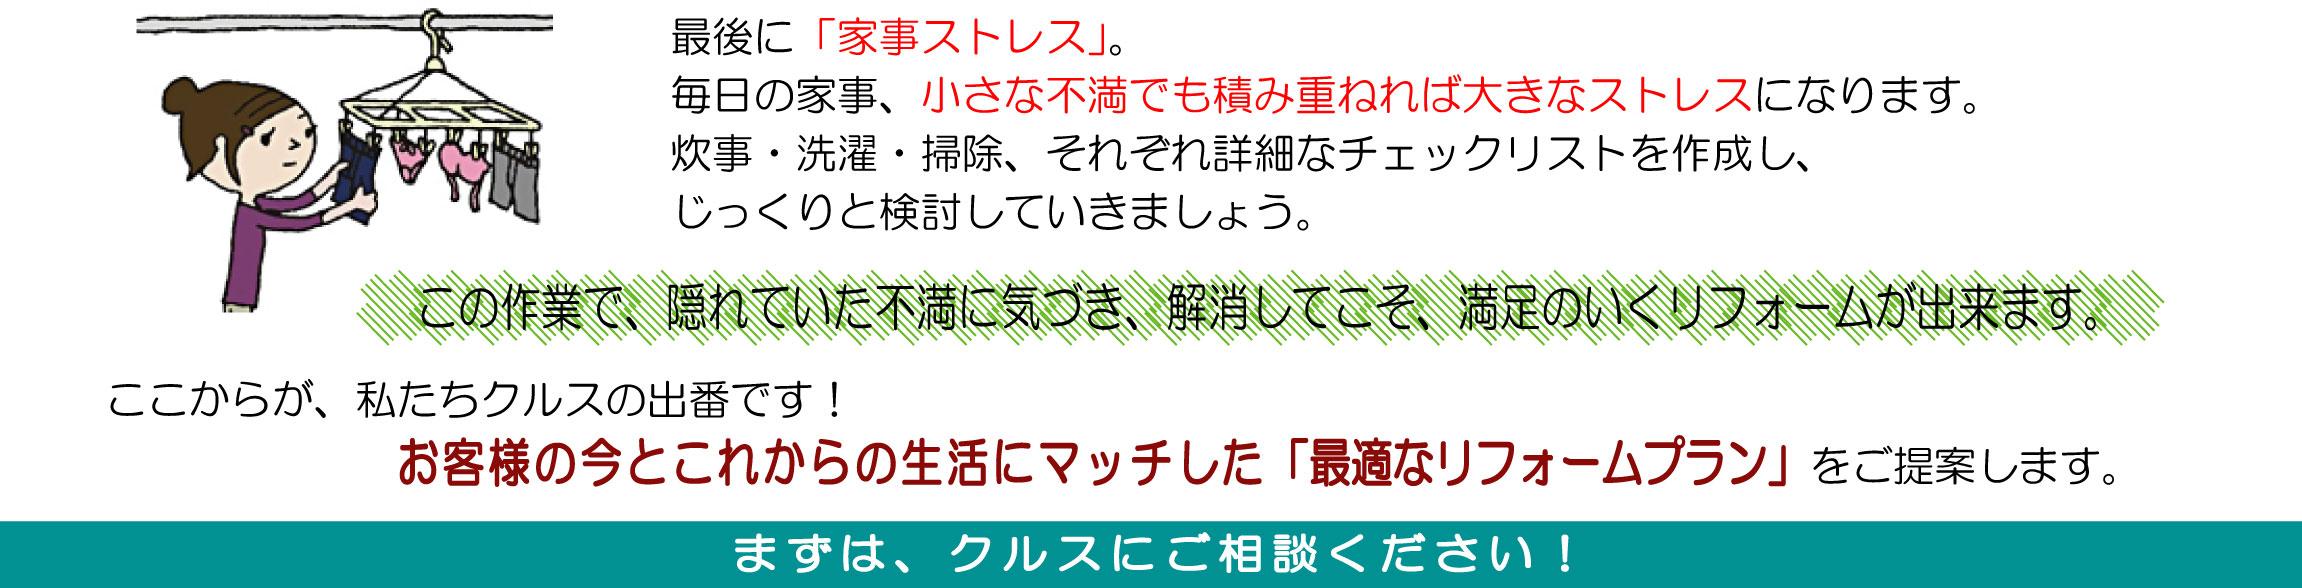 KuraSi-natu-sin70-11.jpg